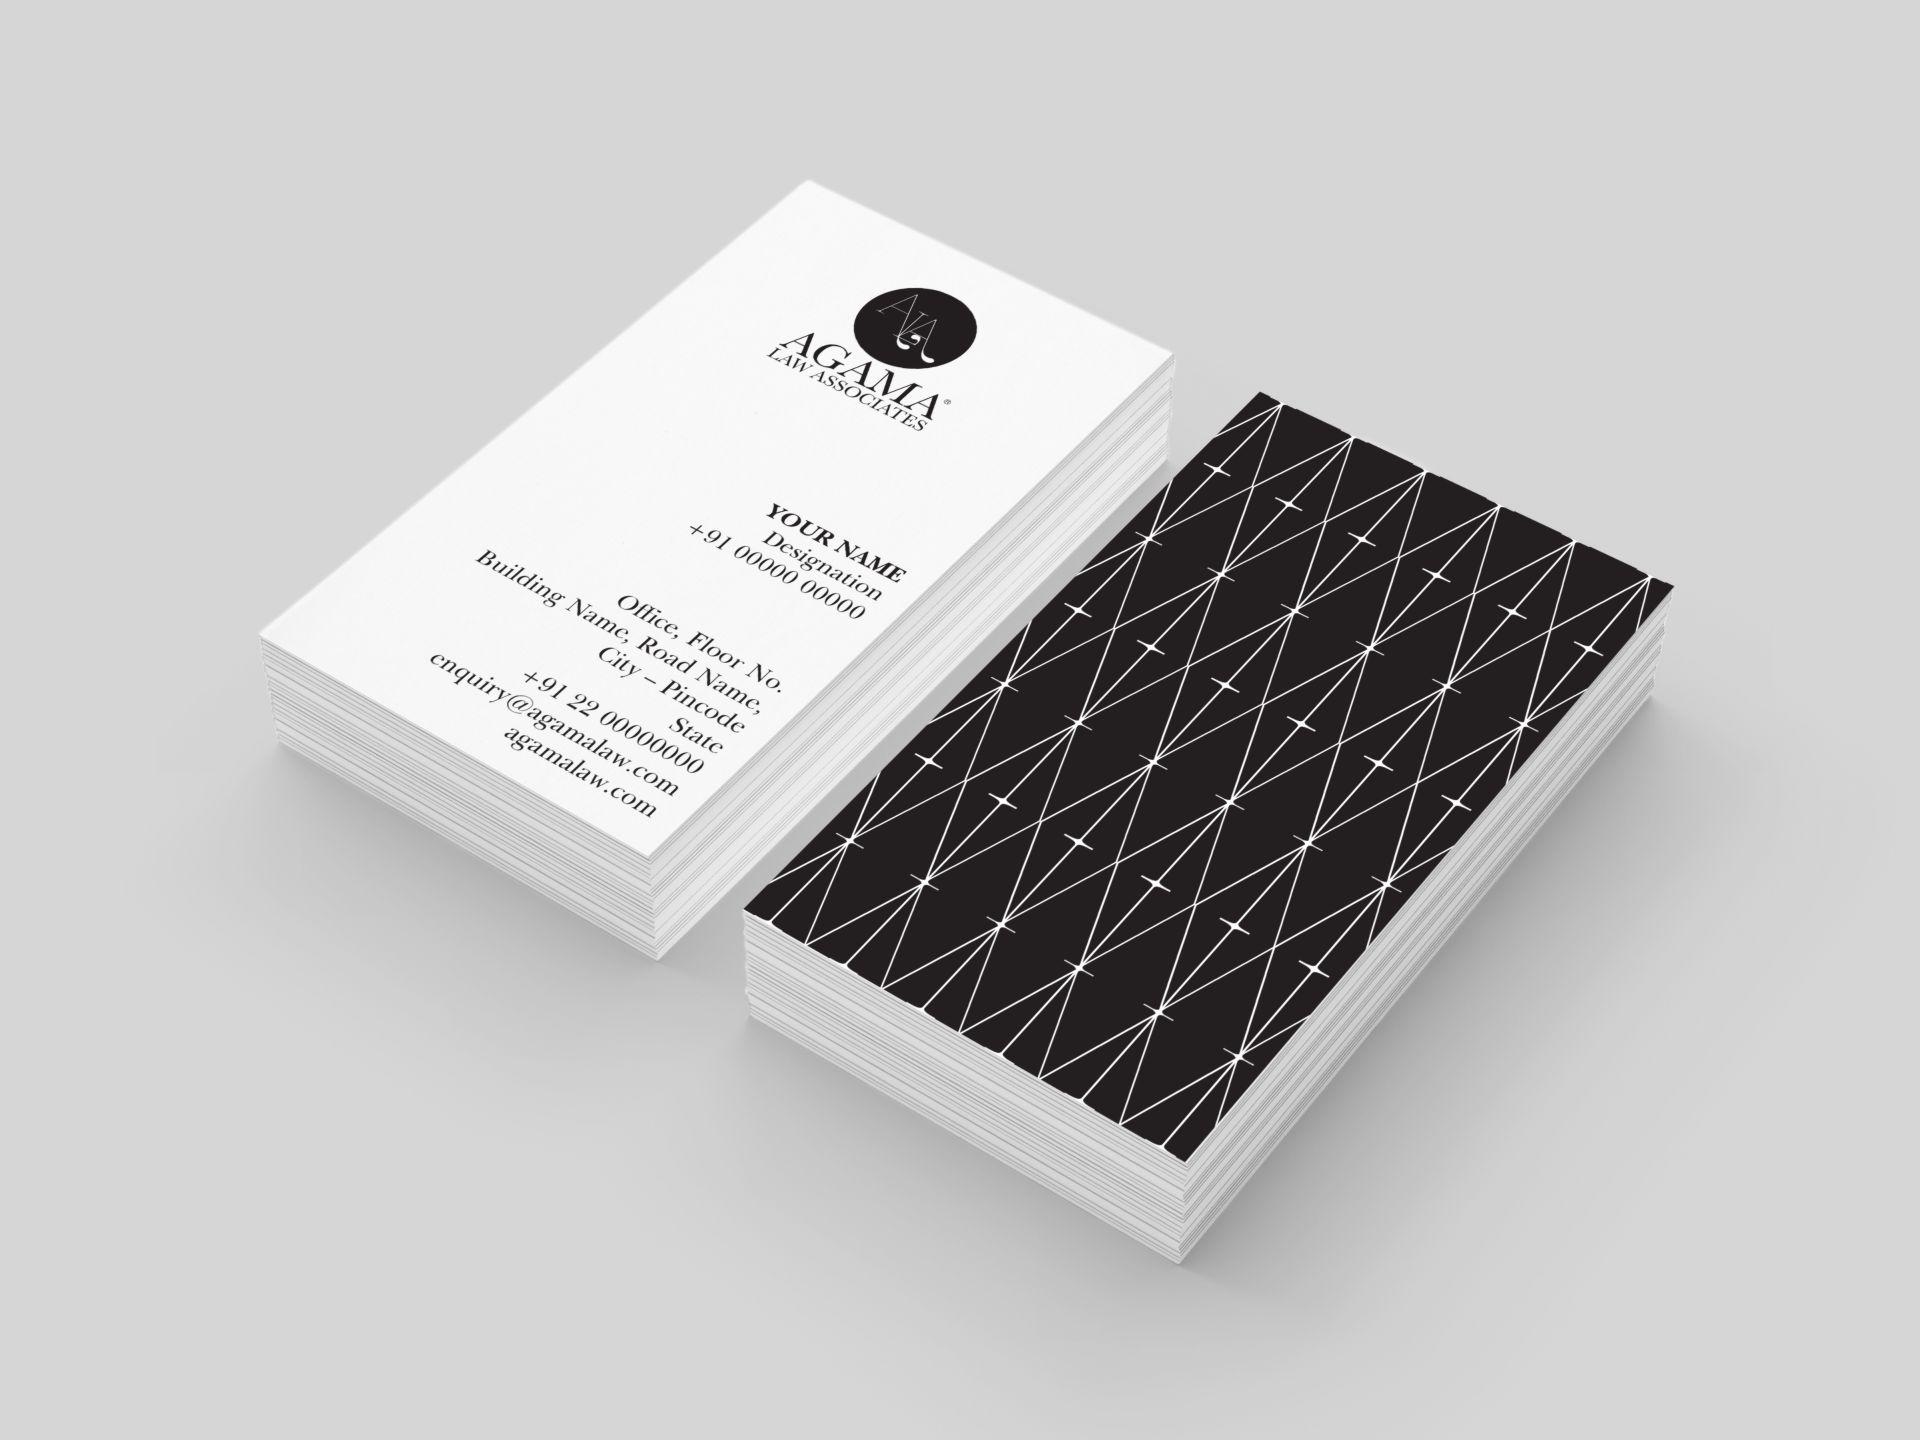 Agama Law Associates - Business Cards